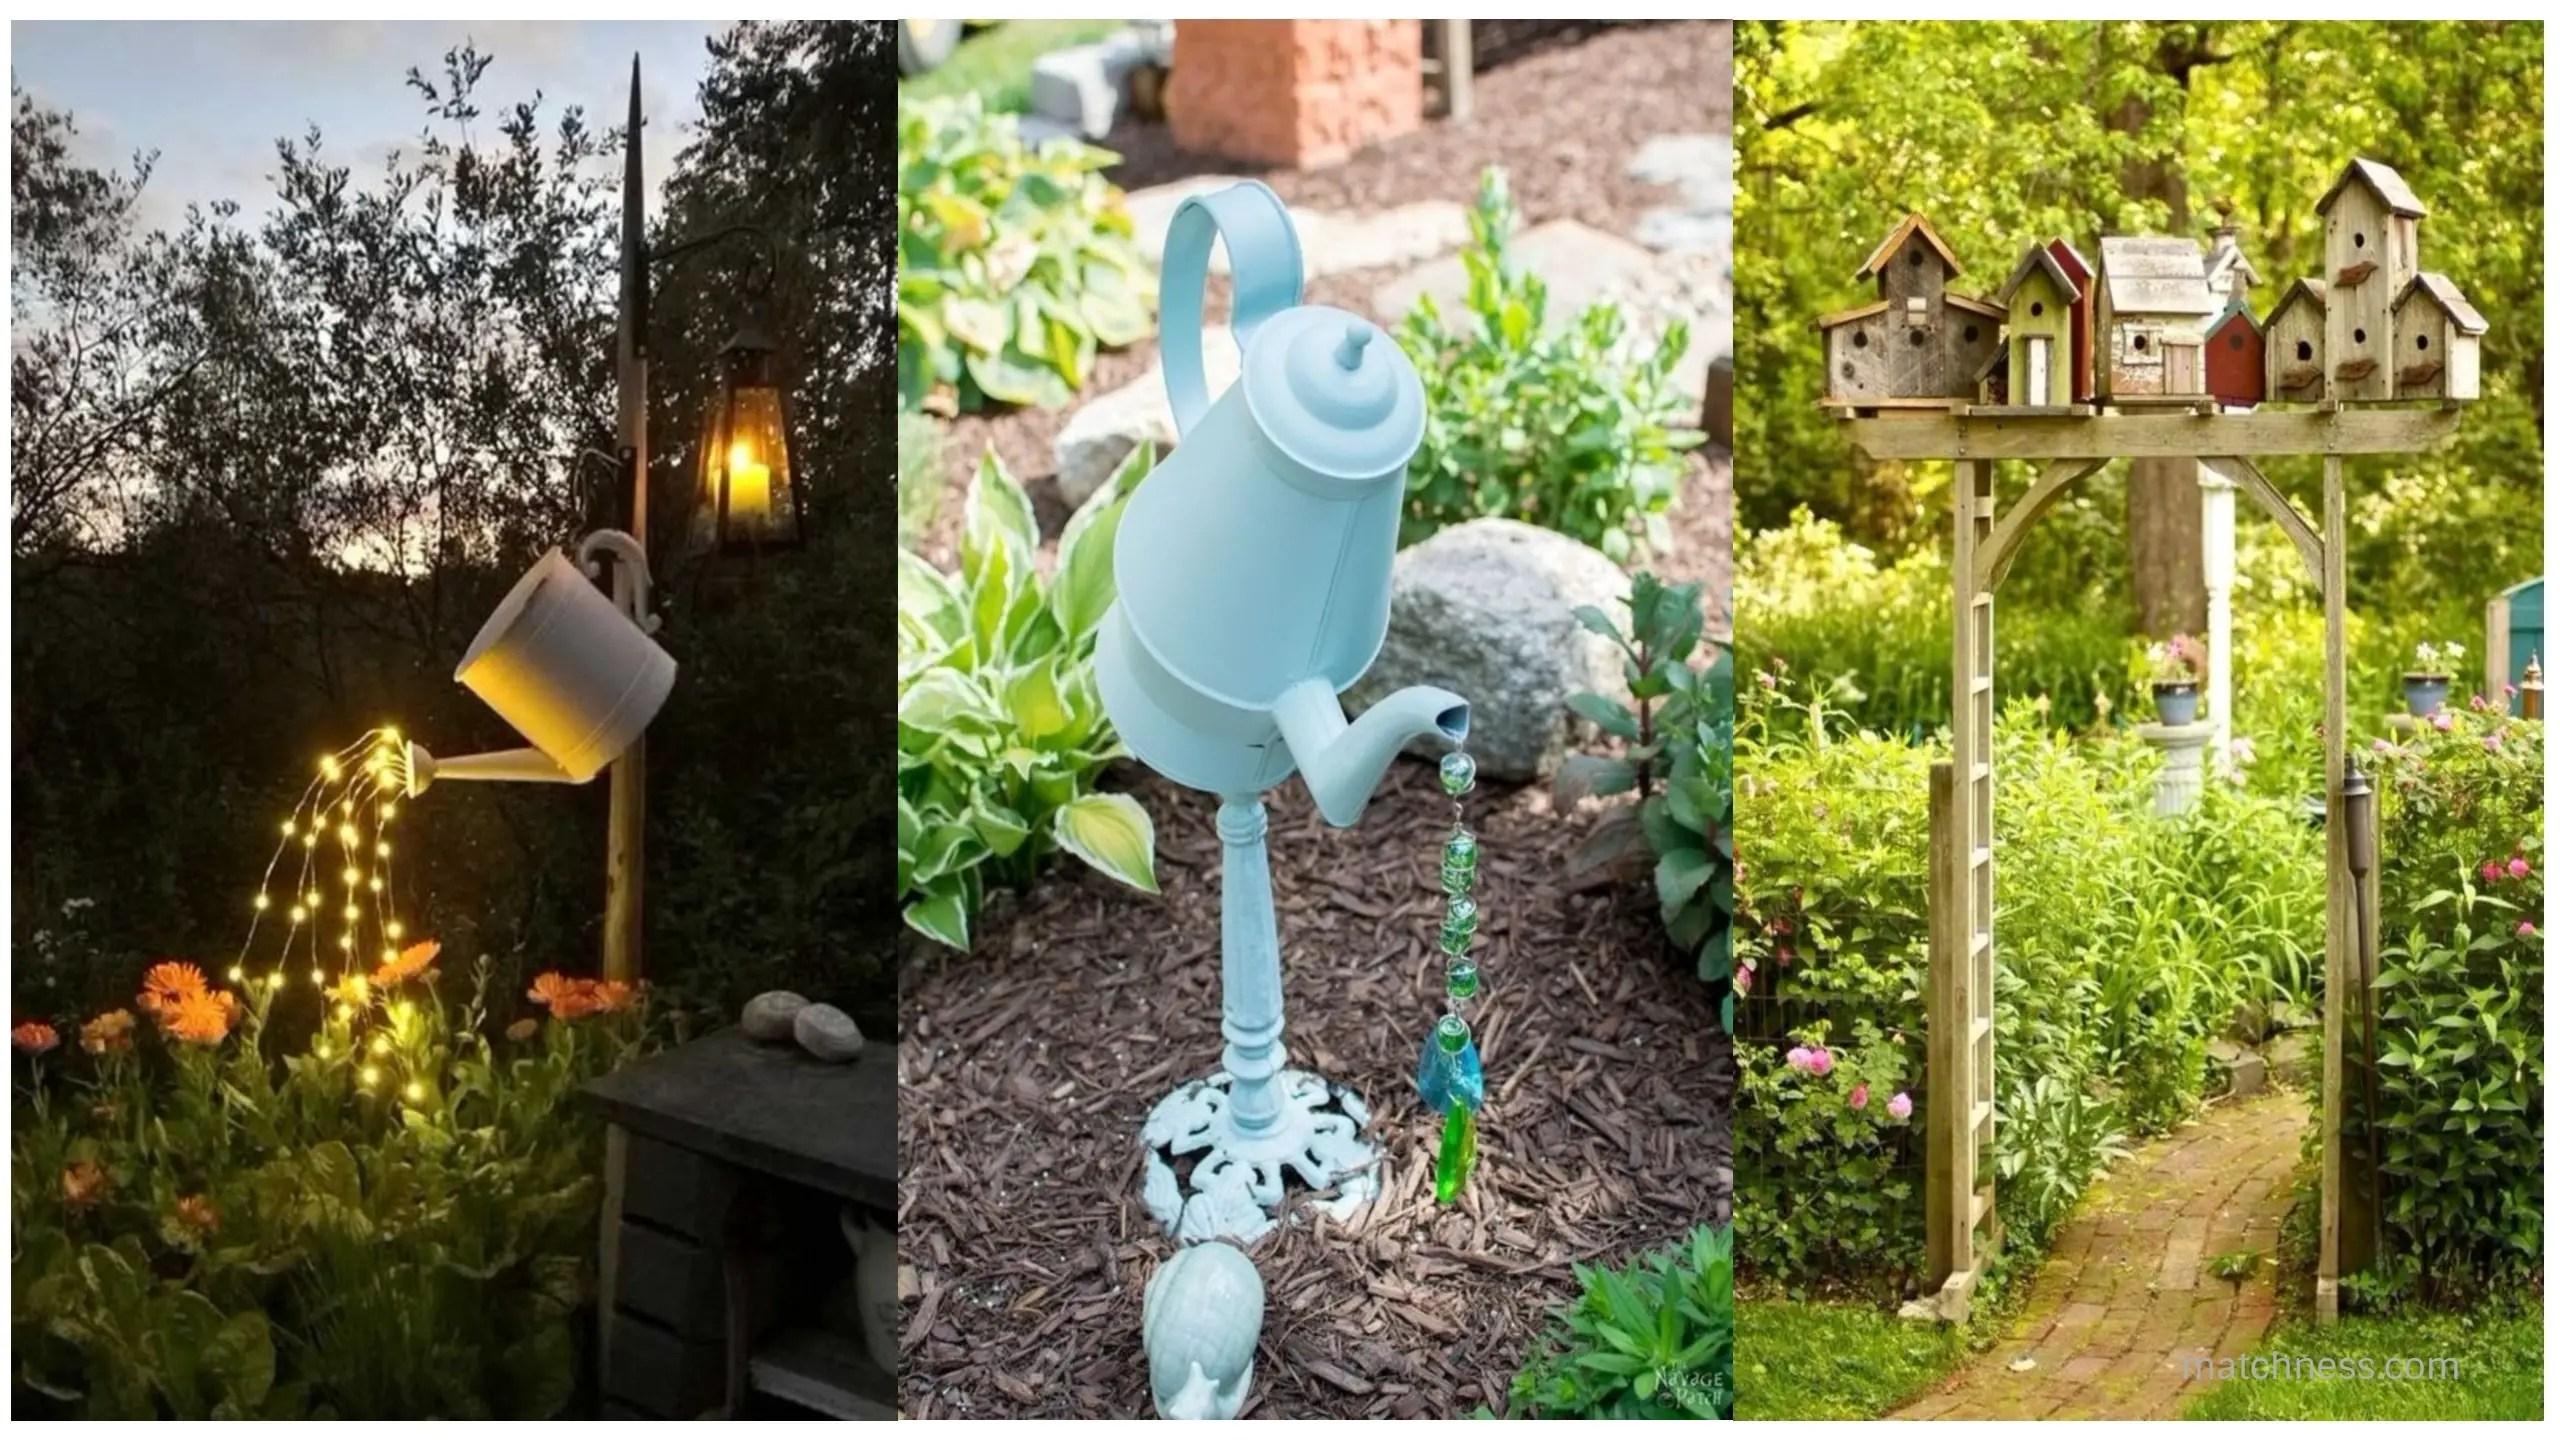 15 DIY Lovely Garden Decor Ideas You Will Love - Matchness.com on Easy Diy Garden Decor id=73009